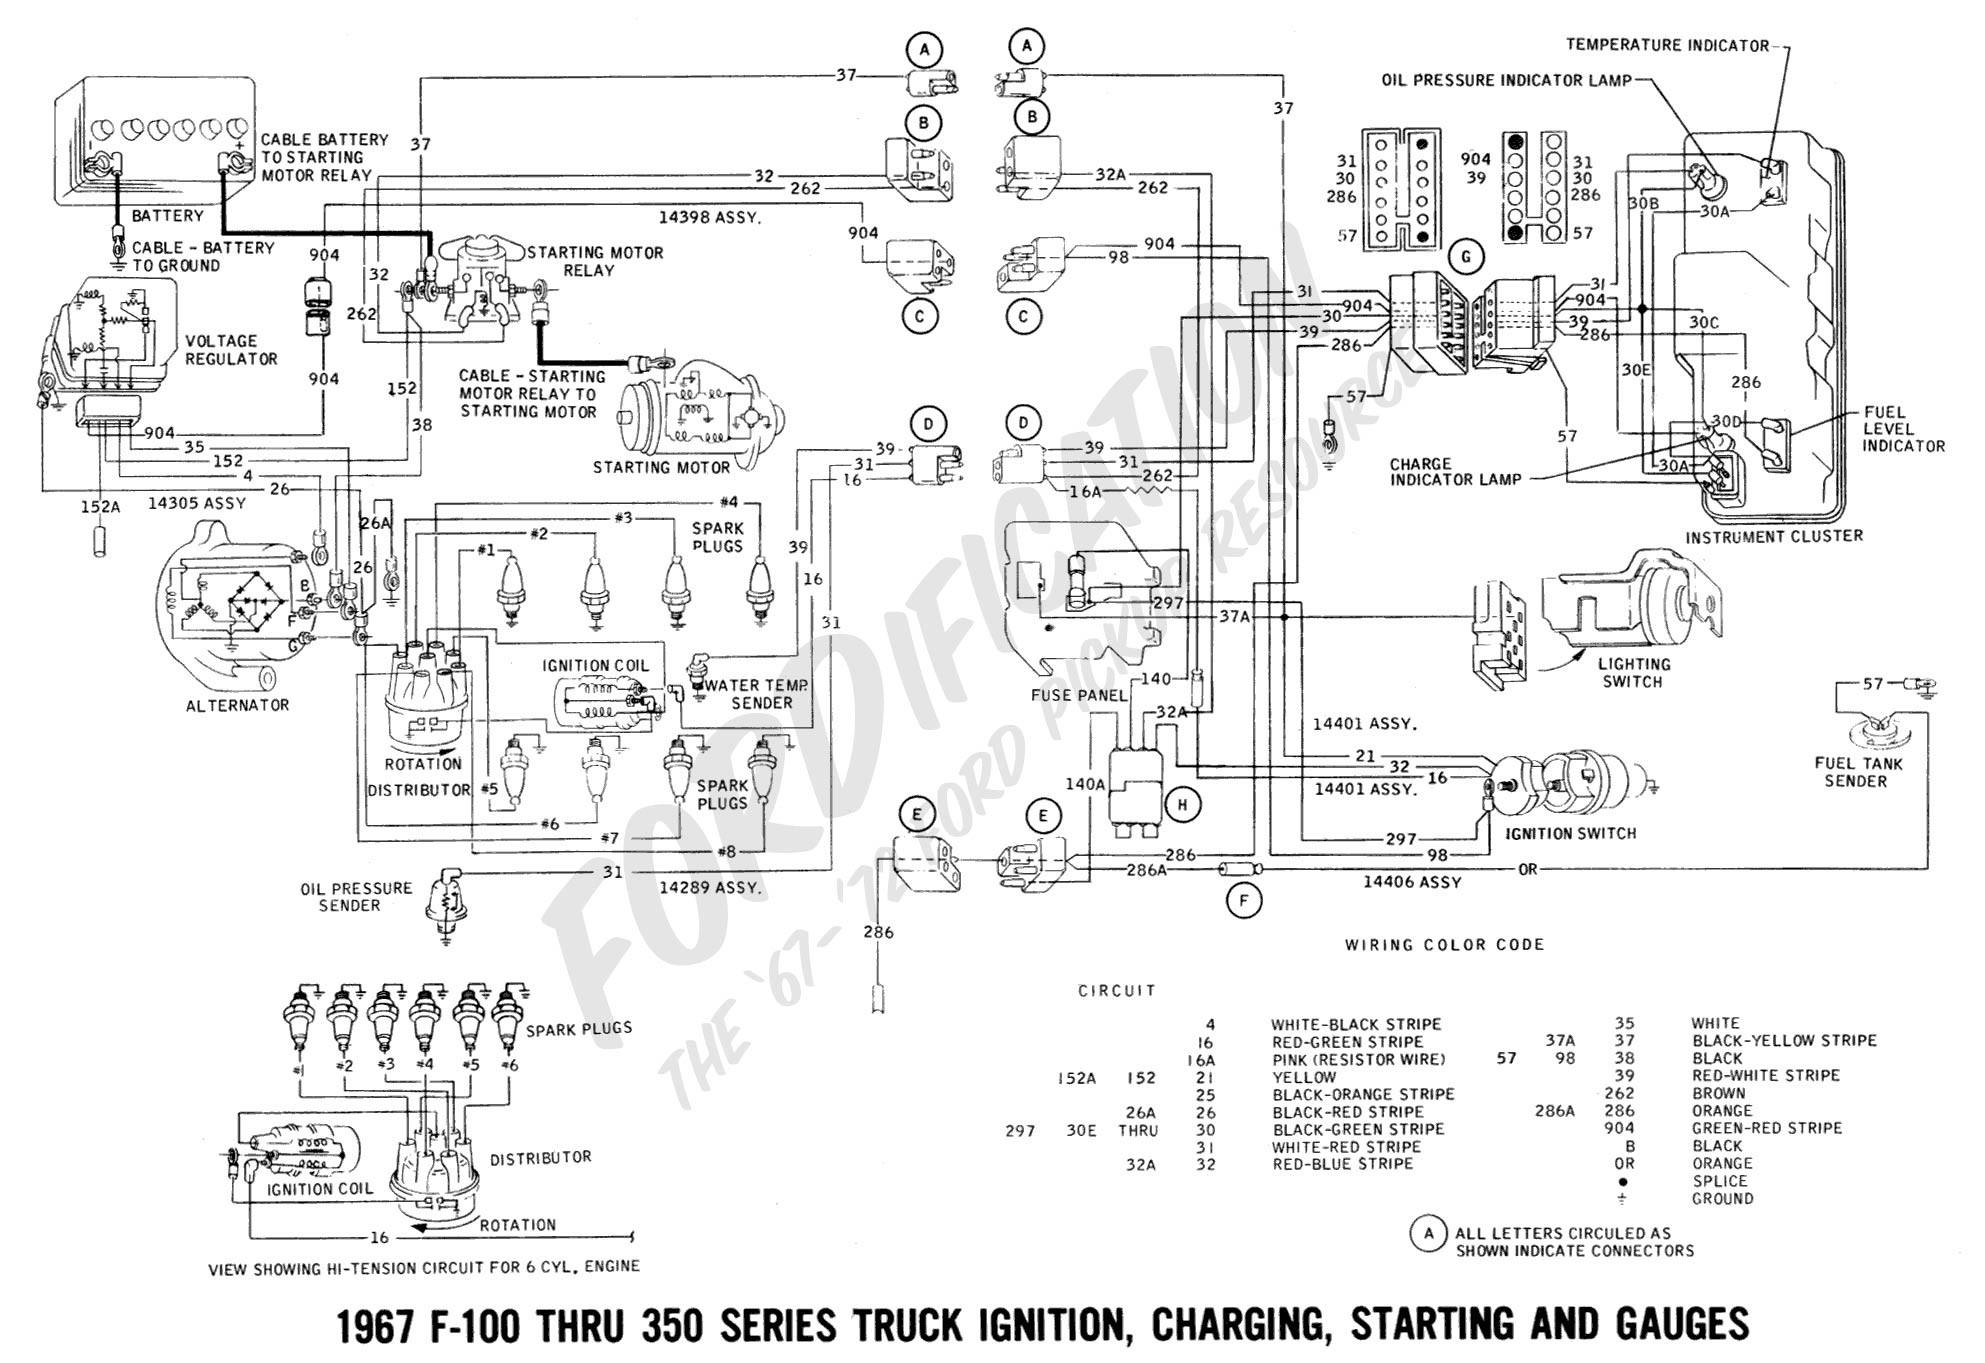 06 tundra wiring diagram